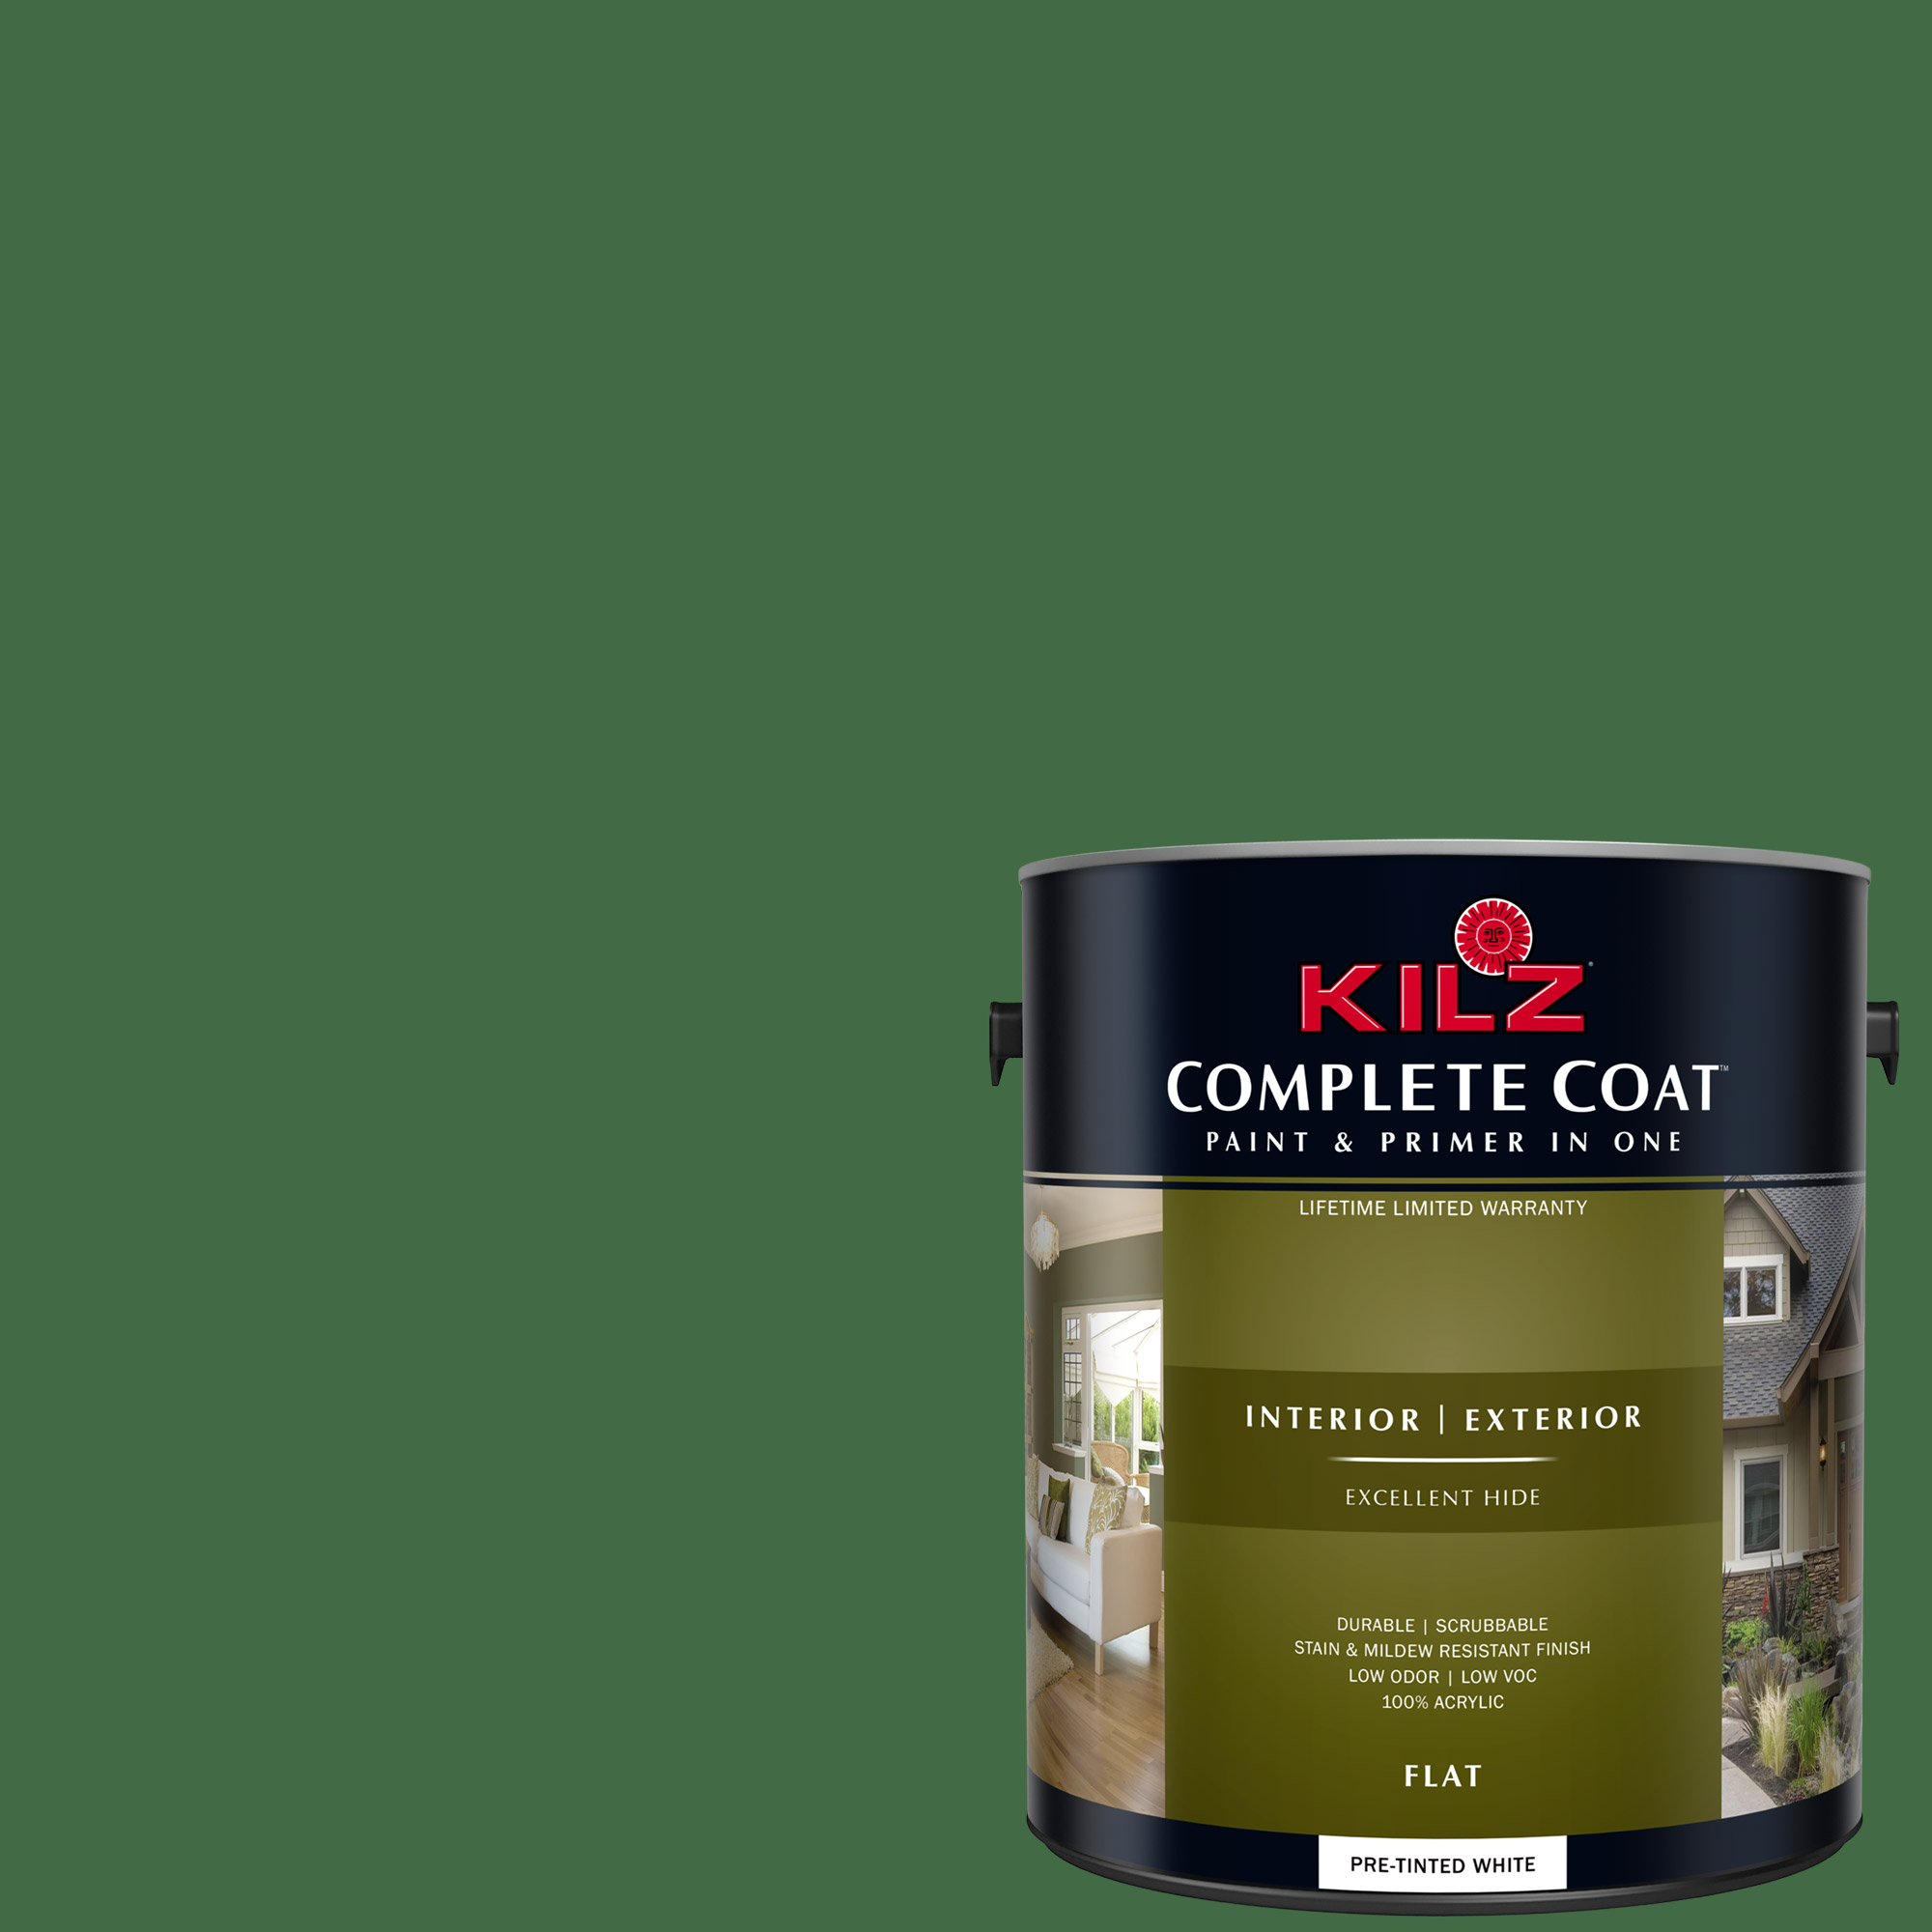 KILZ COMPLETE COAT Interior/Exterior Paint & Primer in One #LG290-02 Flower Leaf